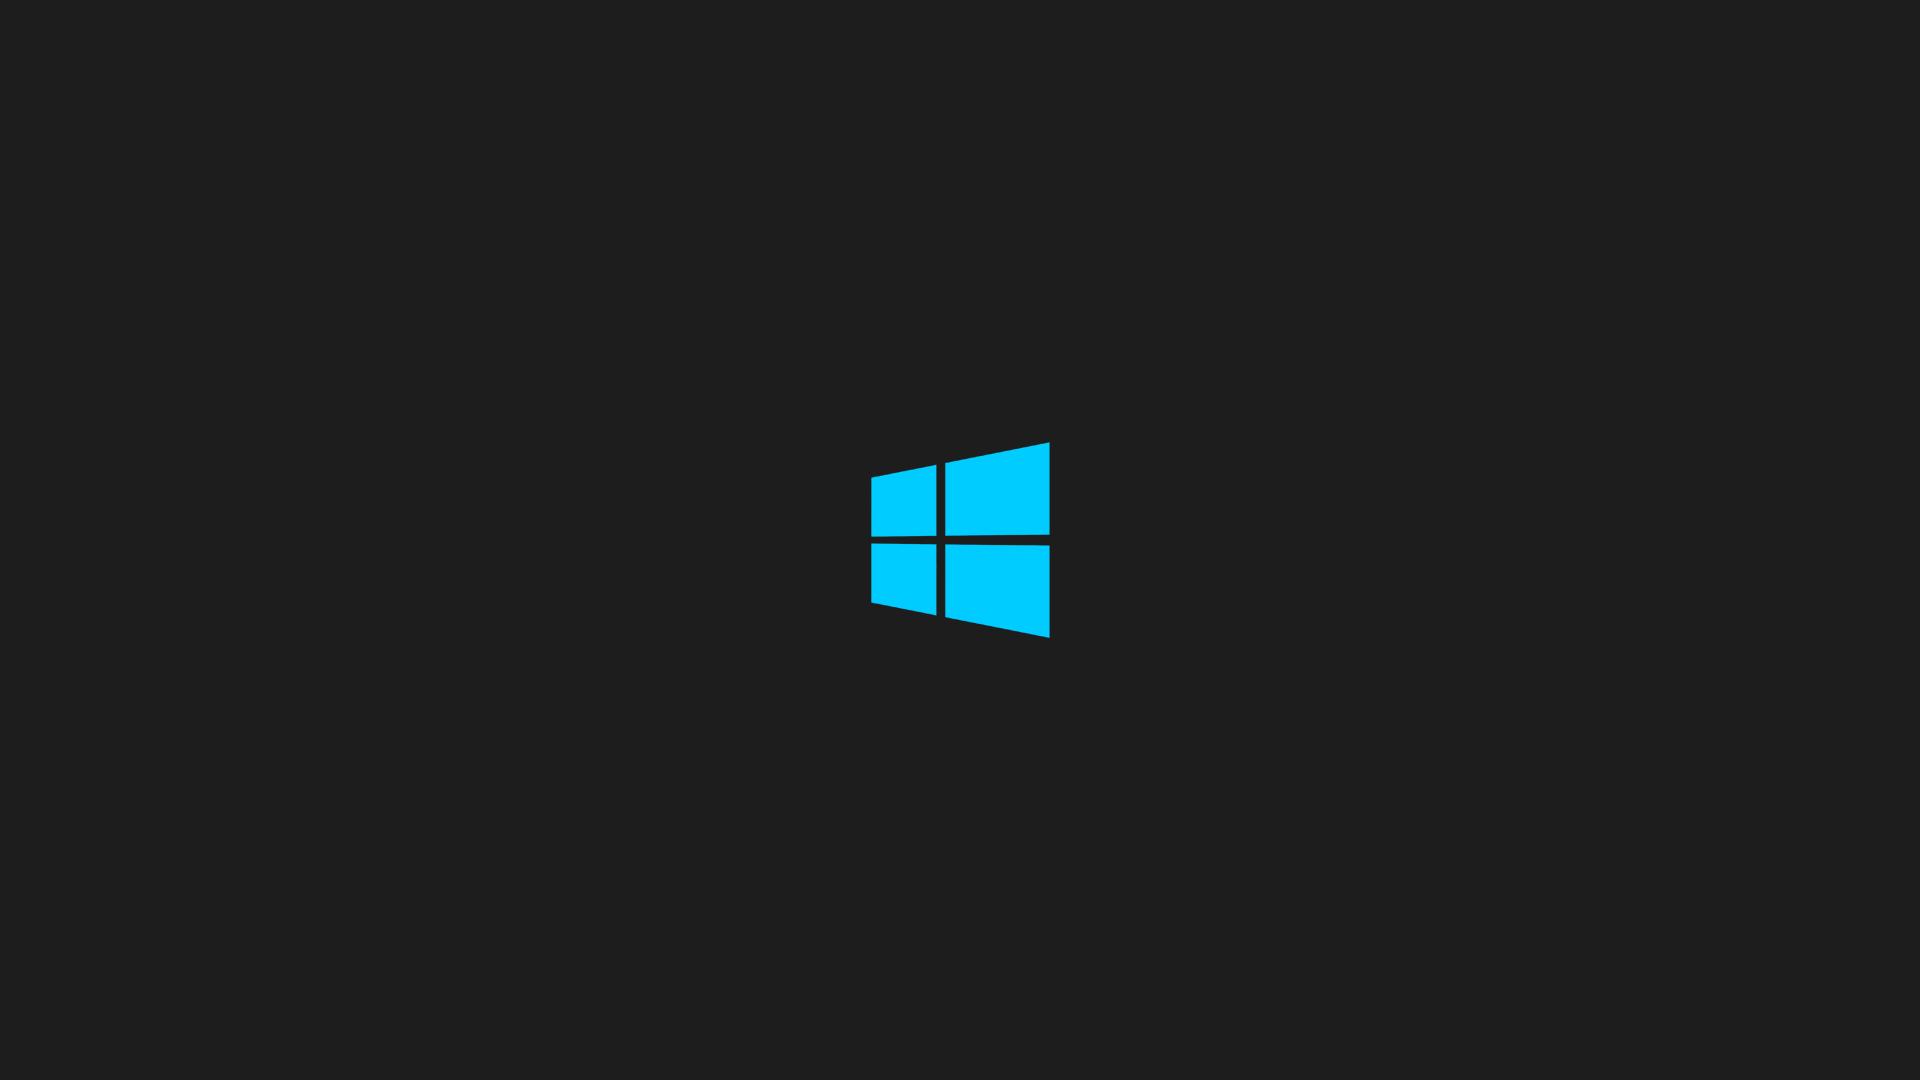 windows-8-dark   wallpaper